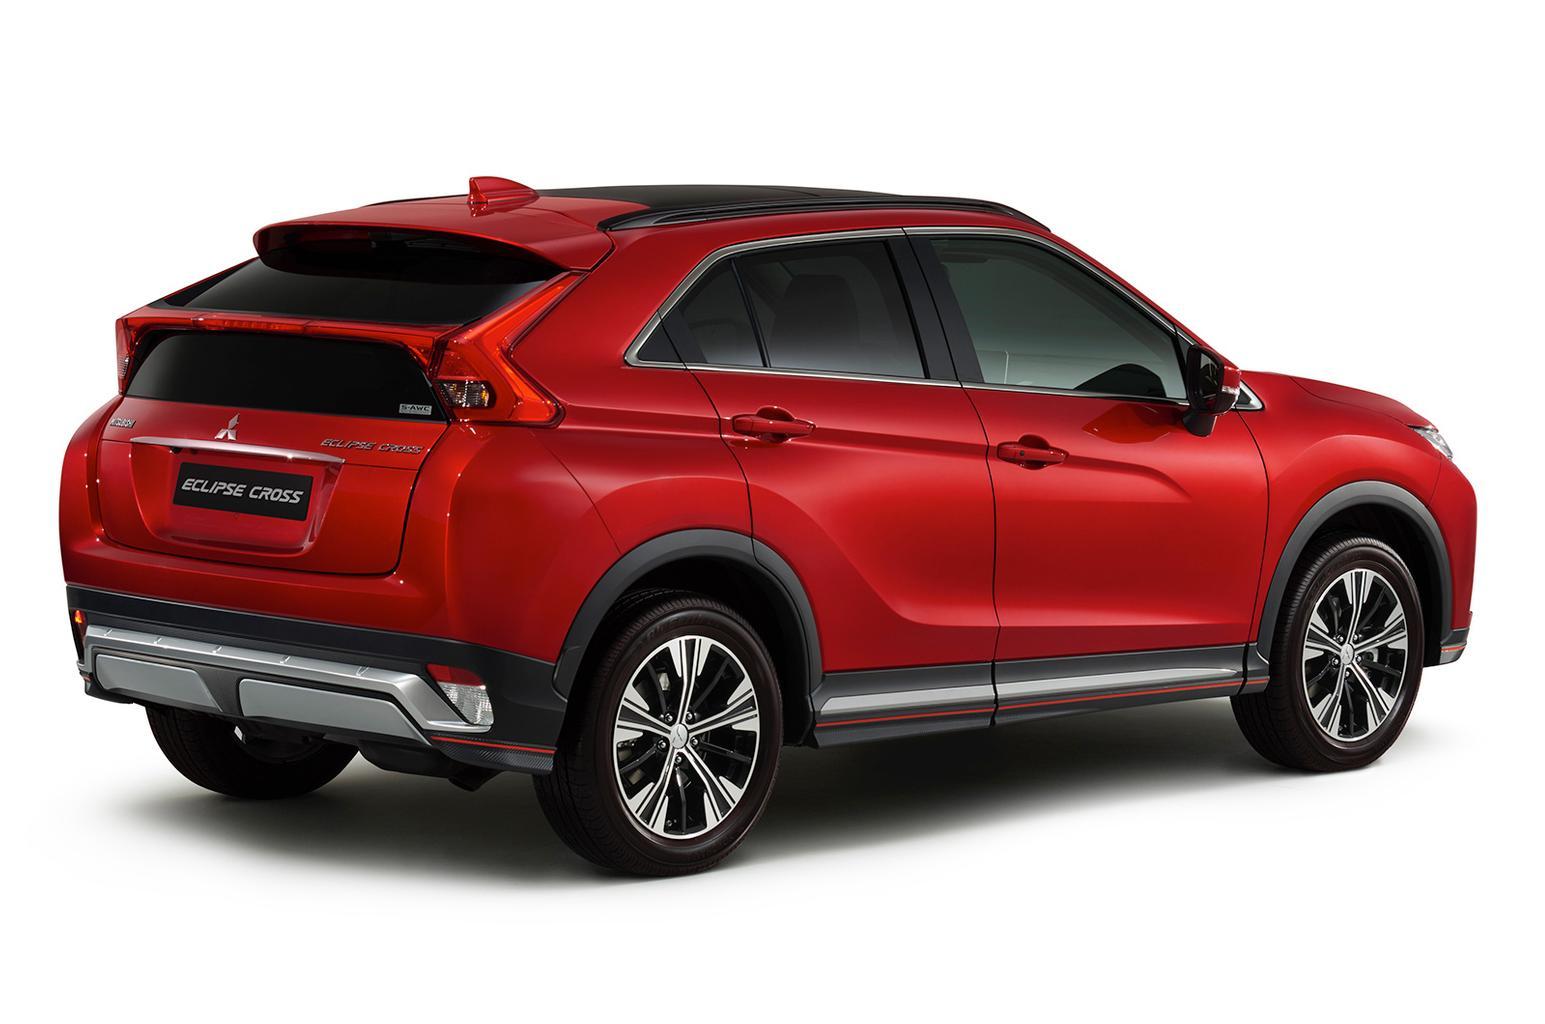 New Mitsubishi Eclipse Cross to take on Nissan Qashqai